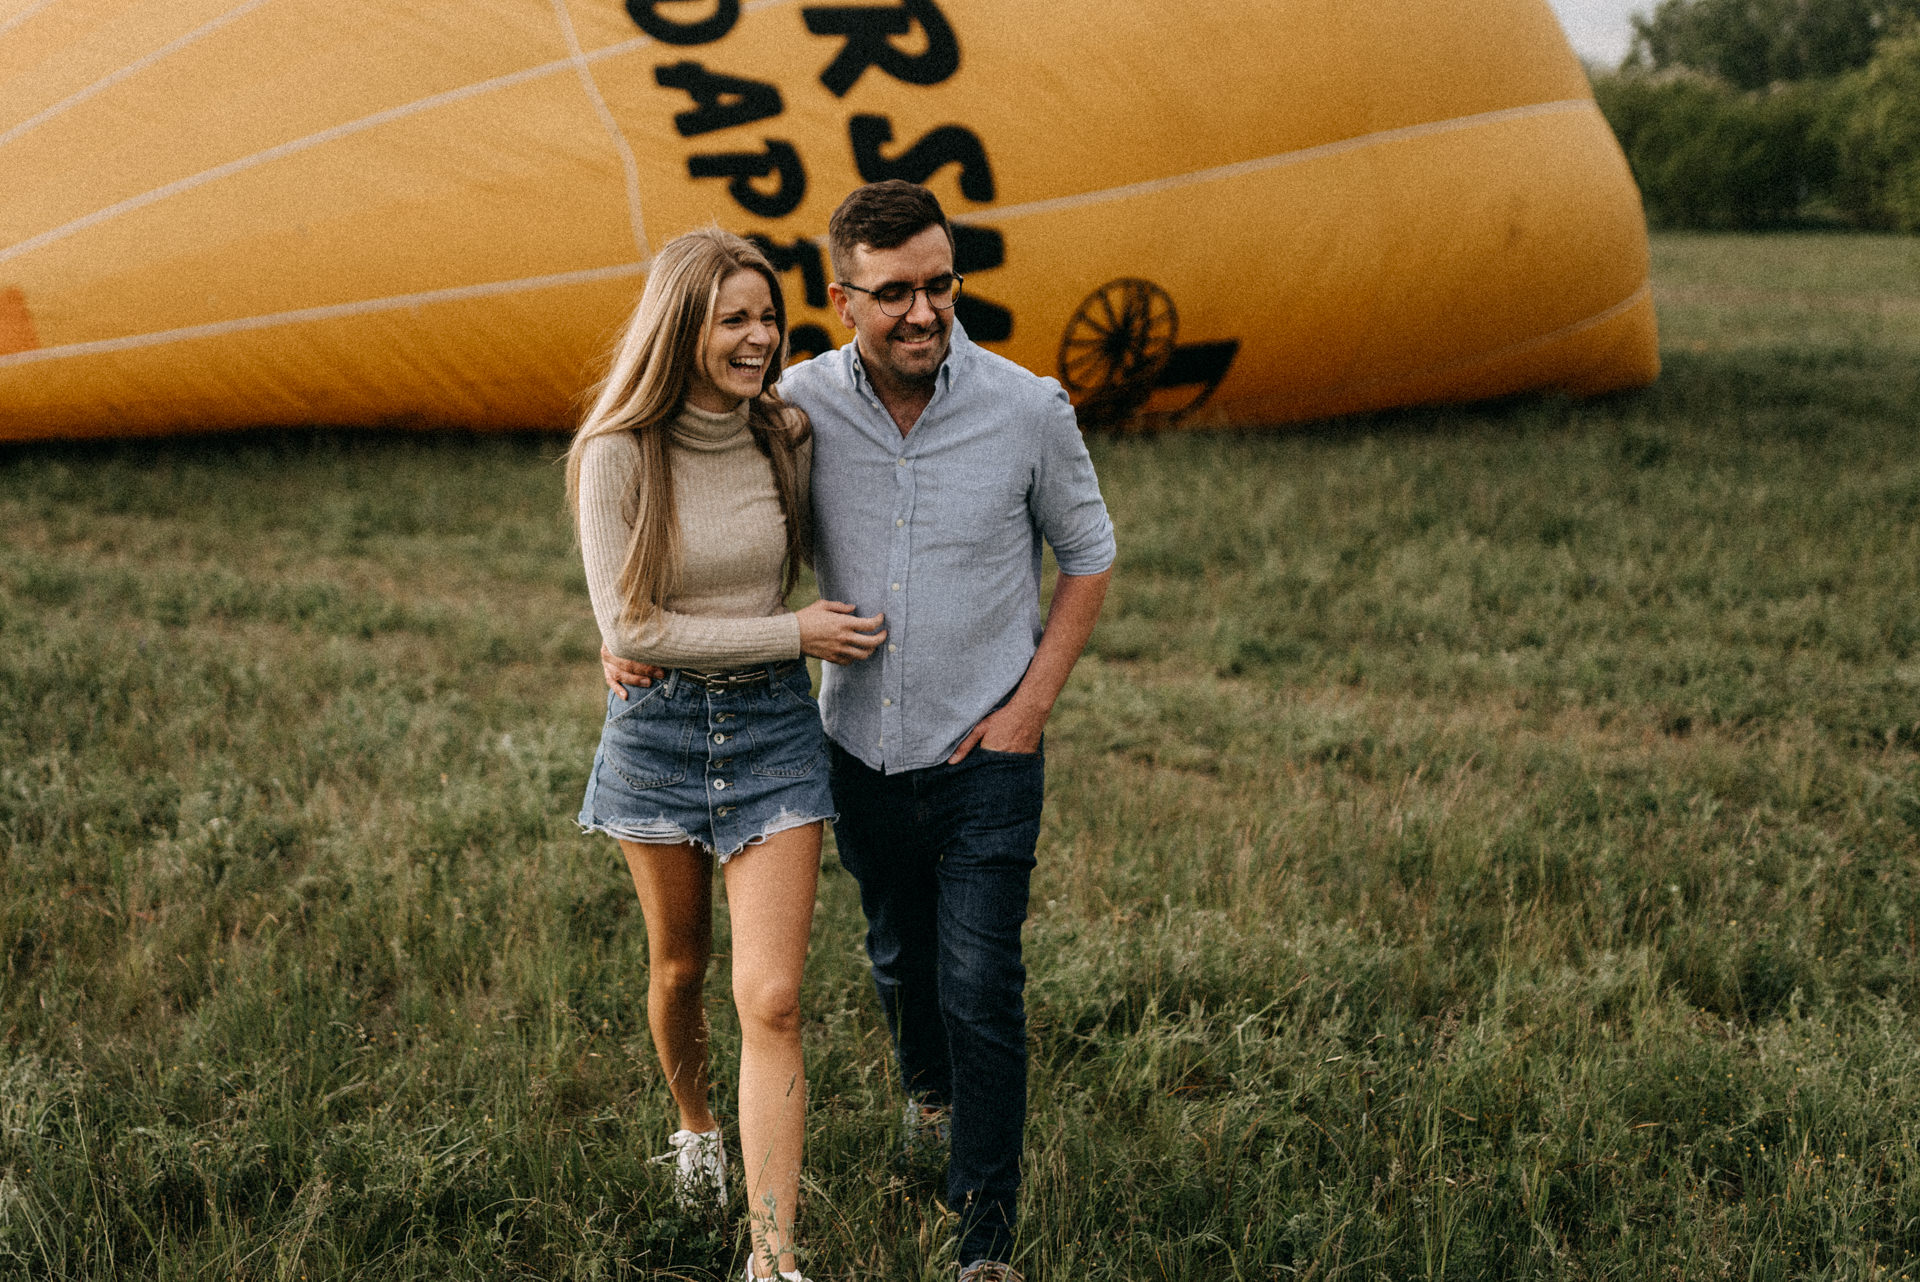 holegballon jegyes fotozas